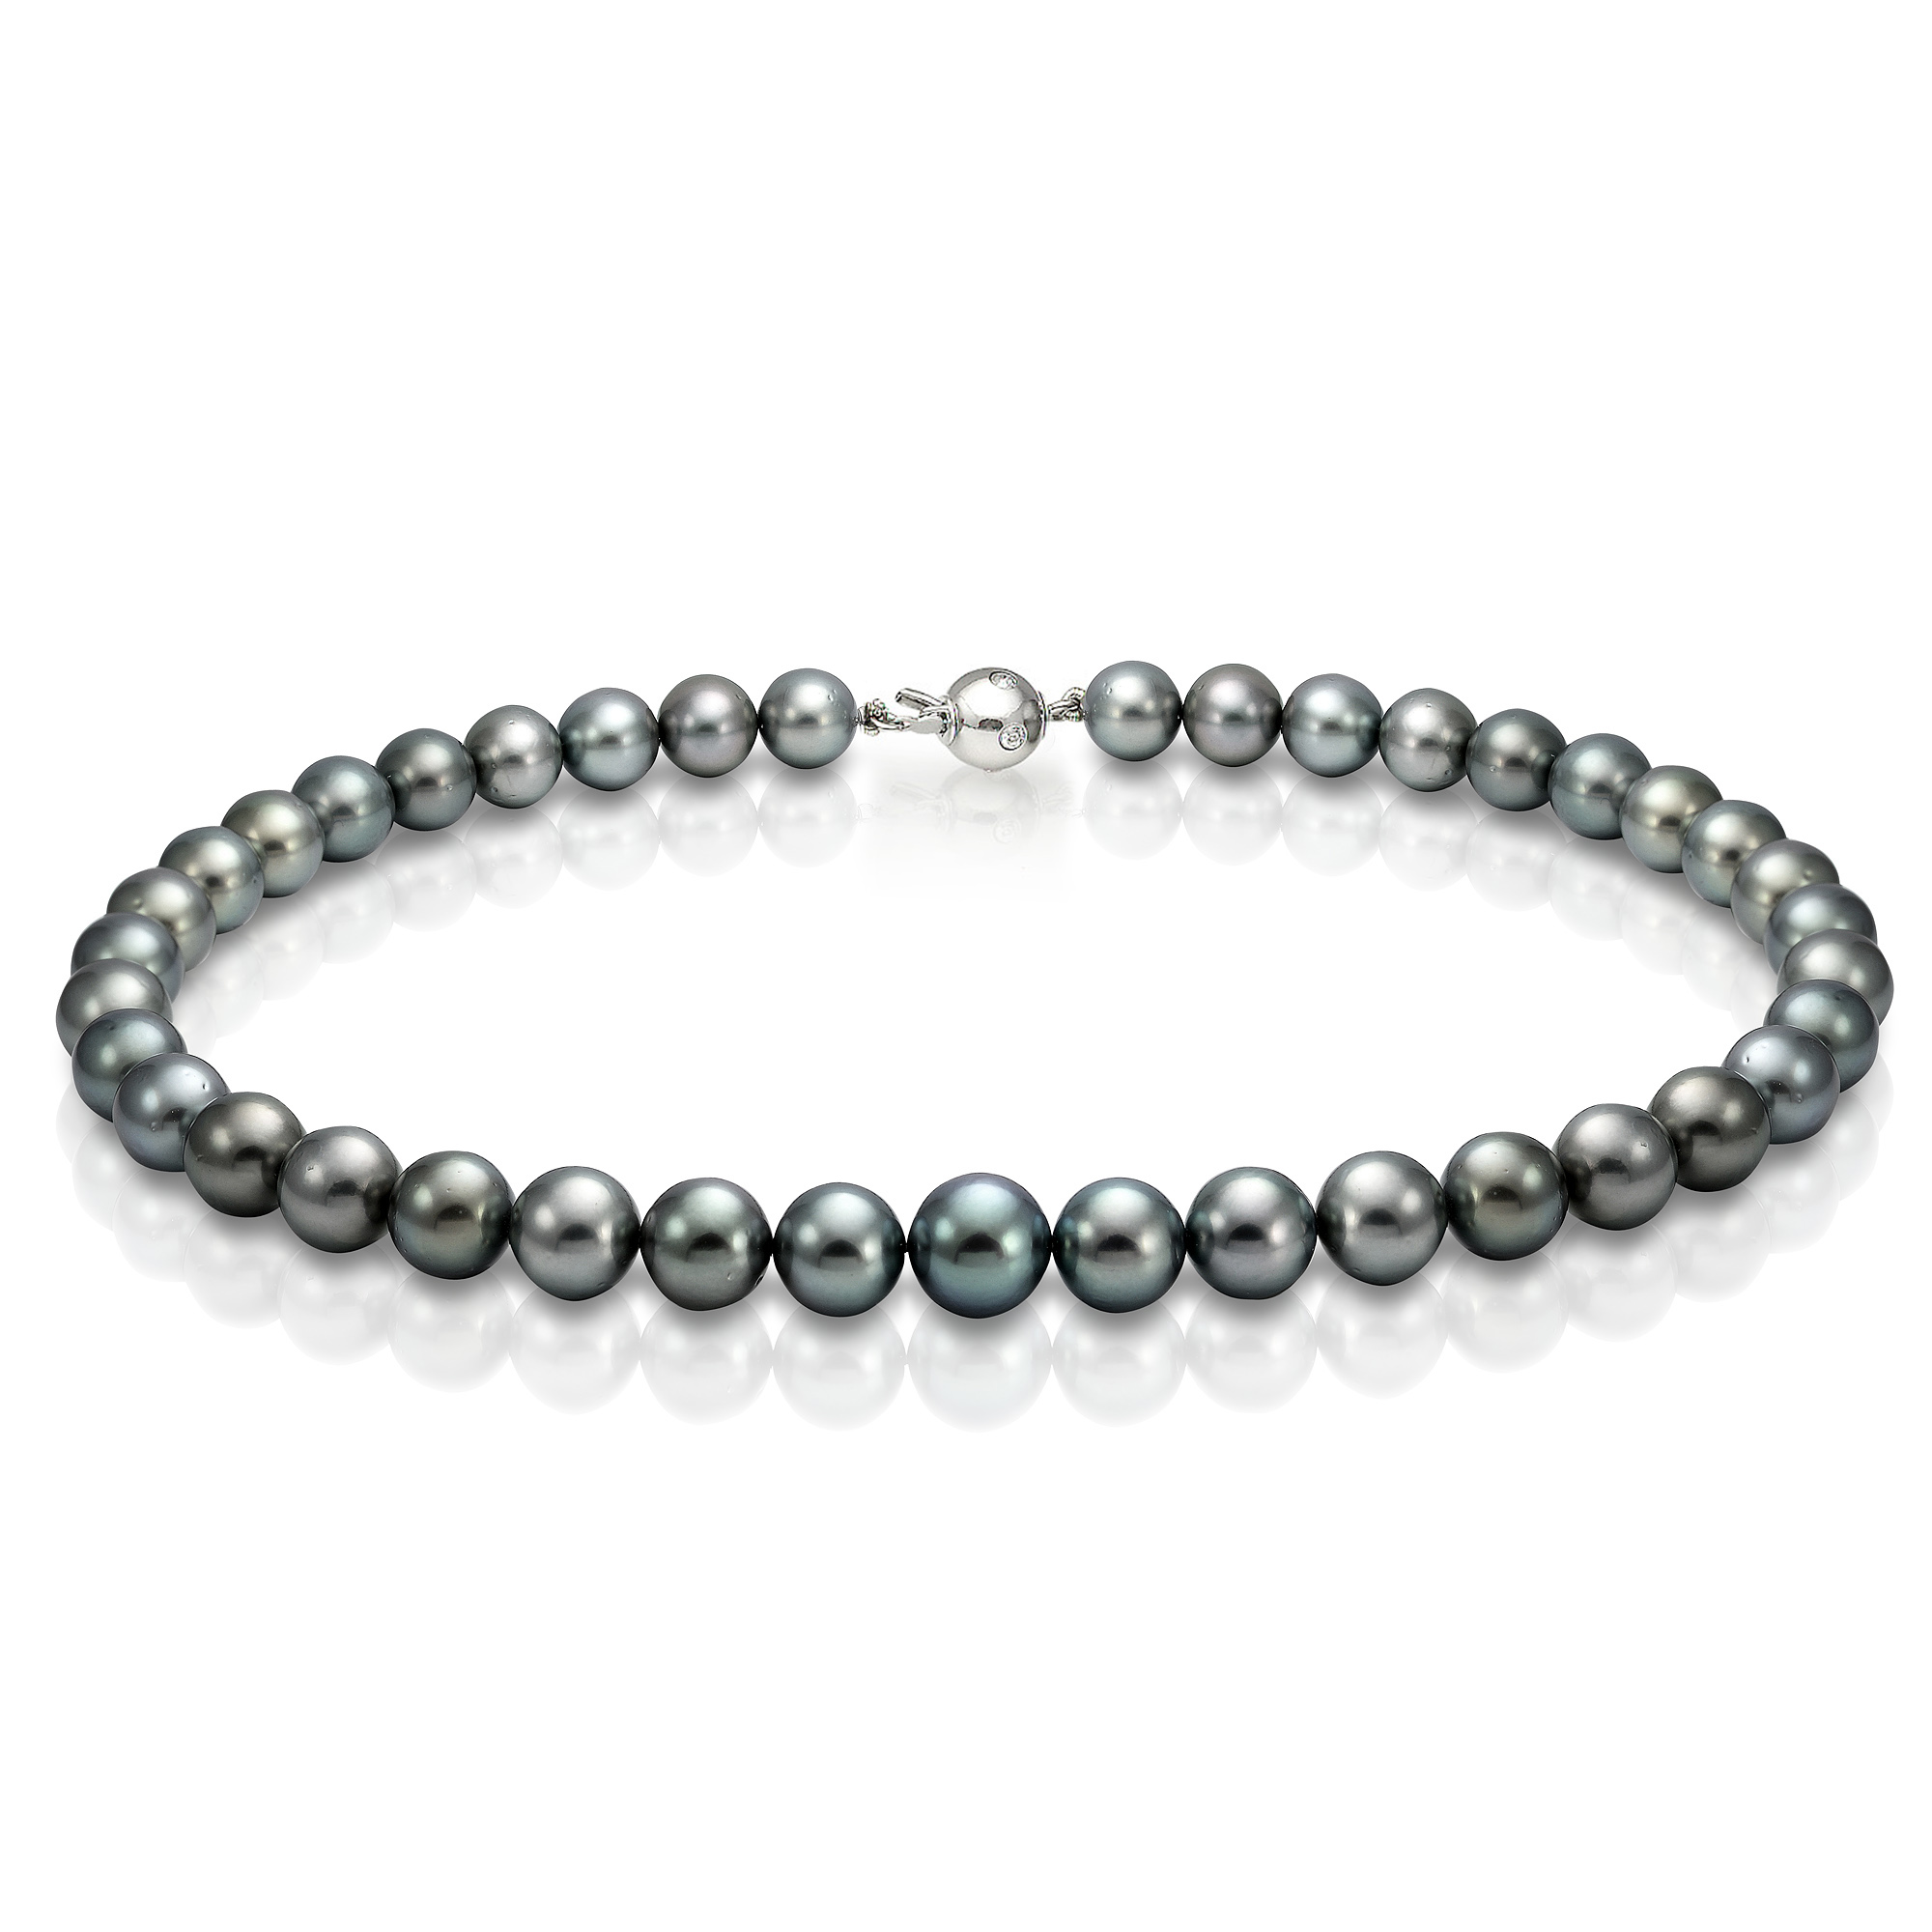 Ожерелье из серебристого круглого морского Таитянского жемчуга 11,1-13,5 мм